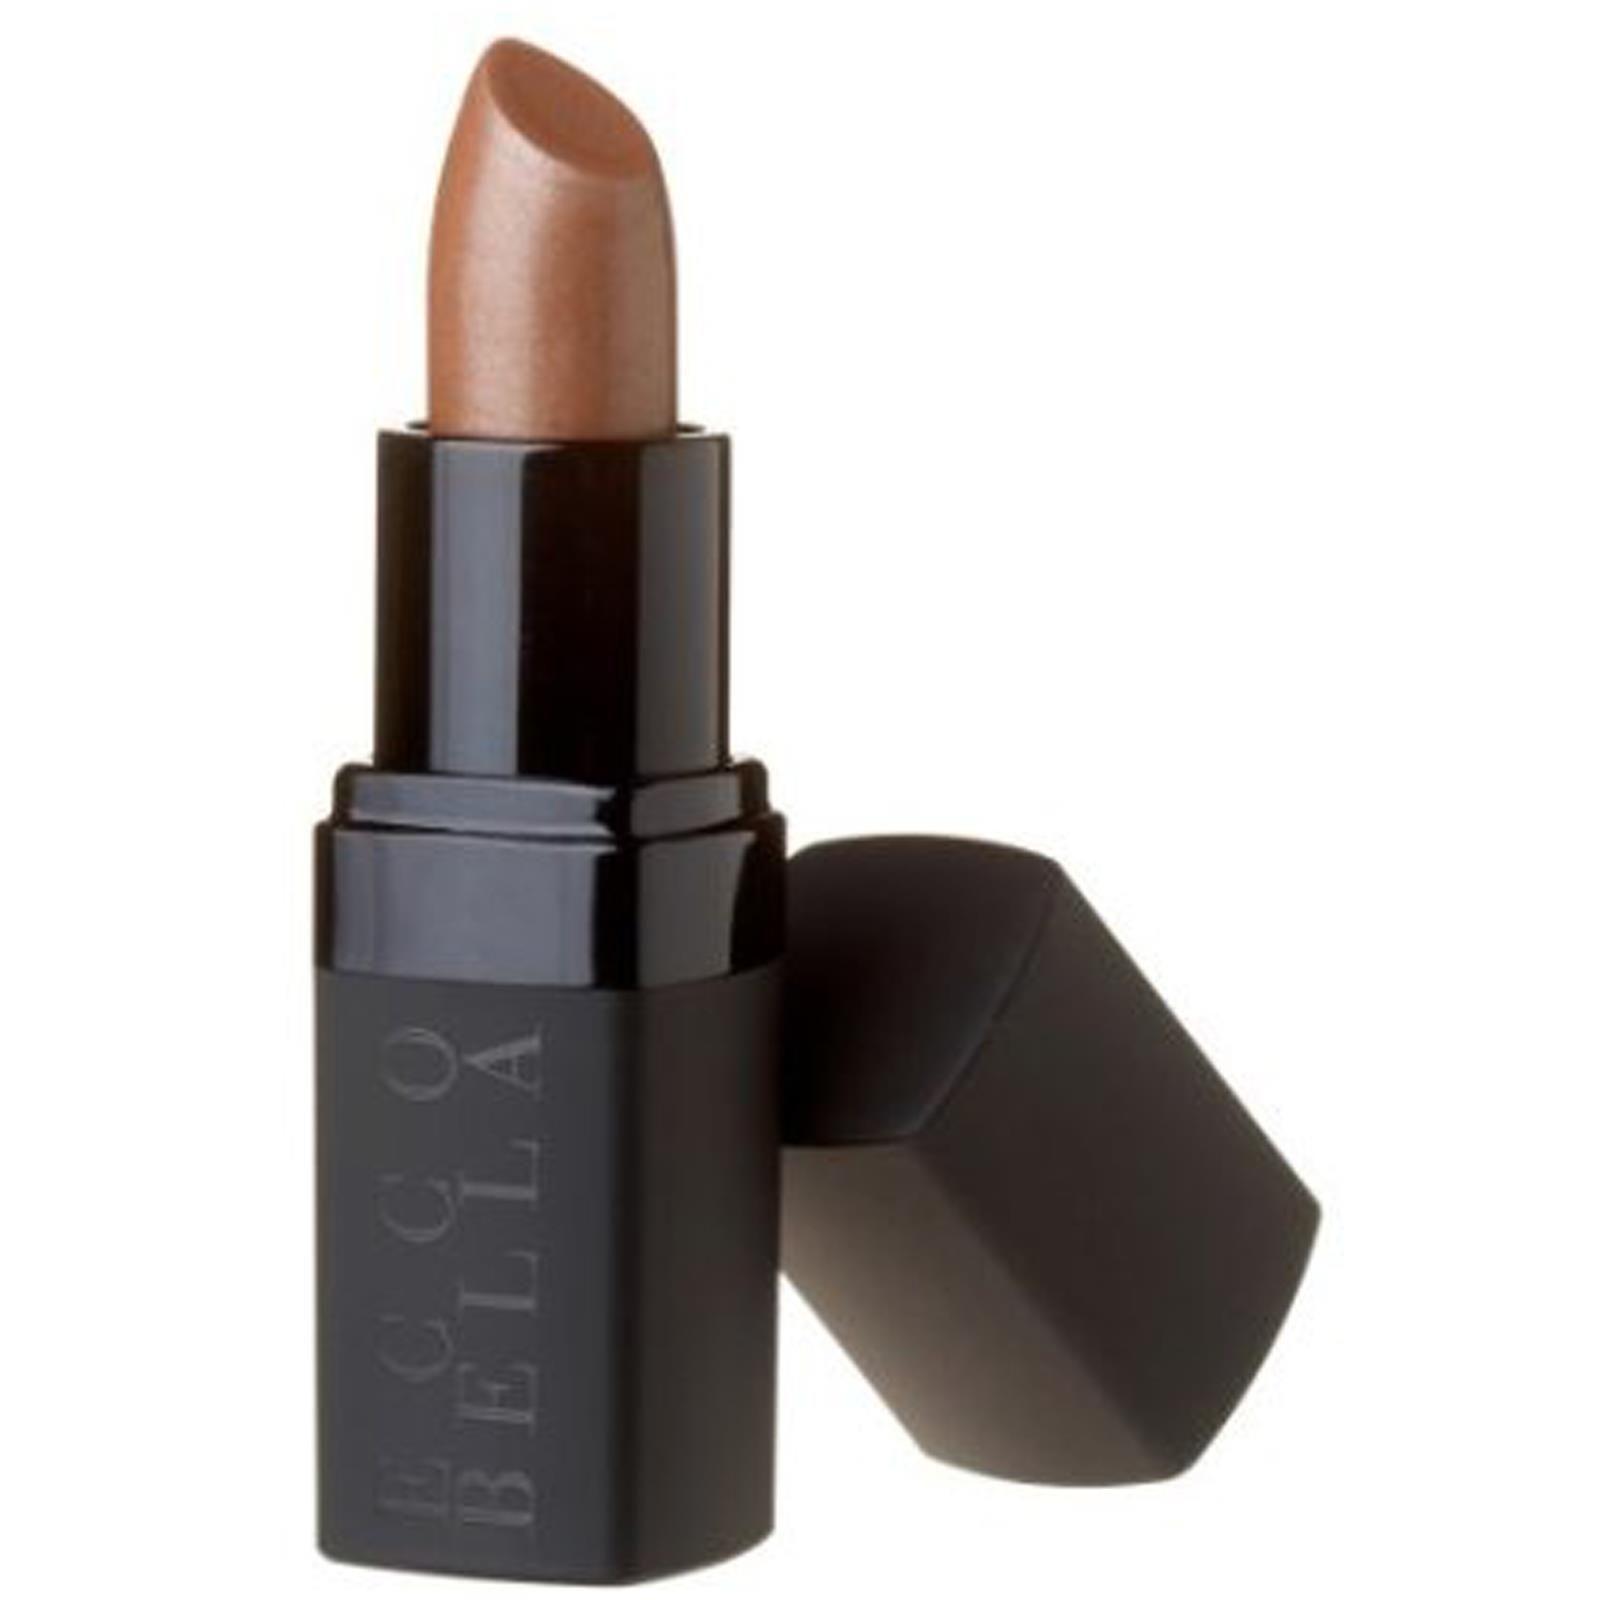 $15 Ecco Bella, FlowerColor Lipstick, Almond, .13 oz (3 g) - iHerb.com